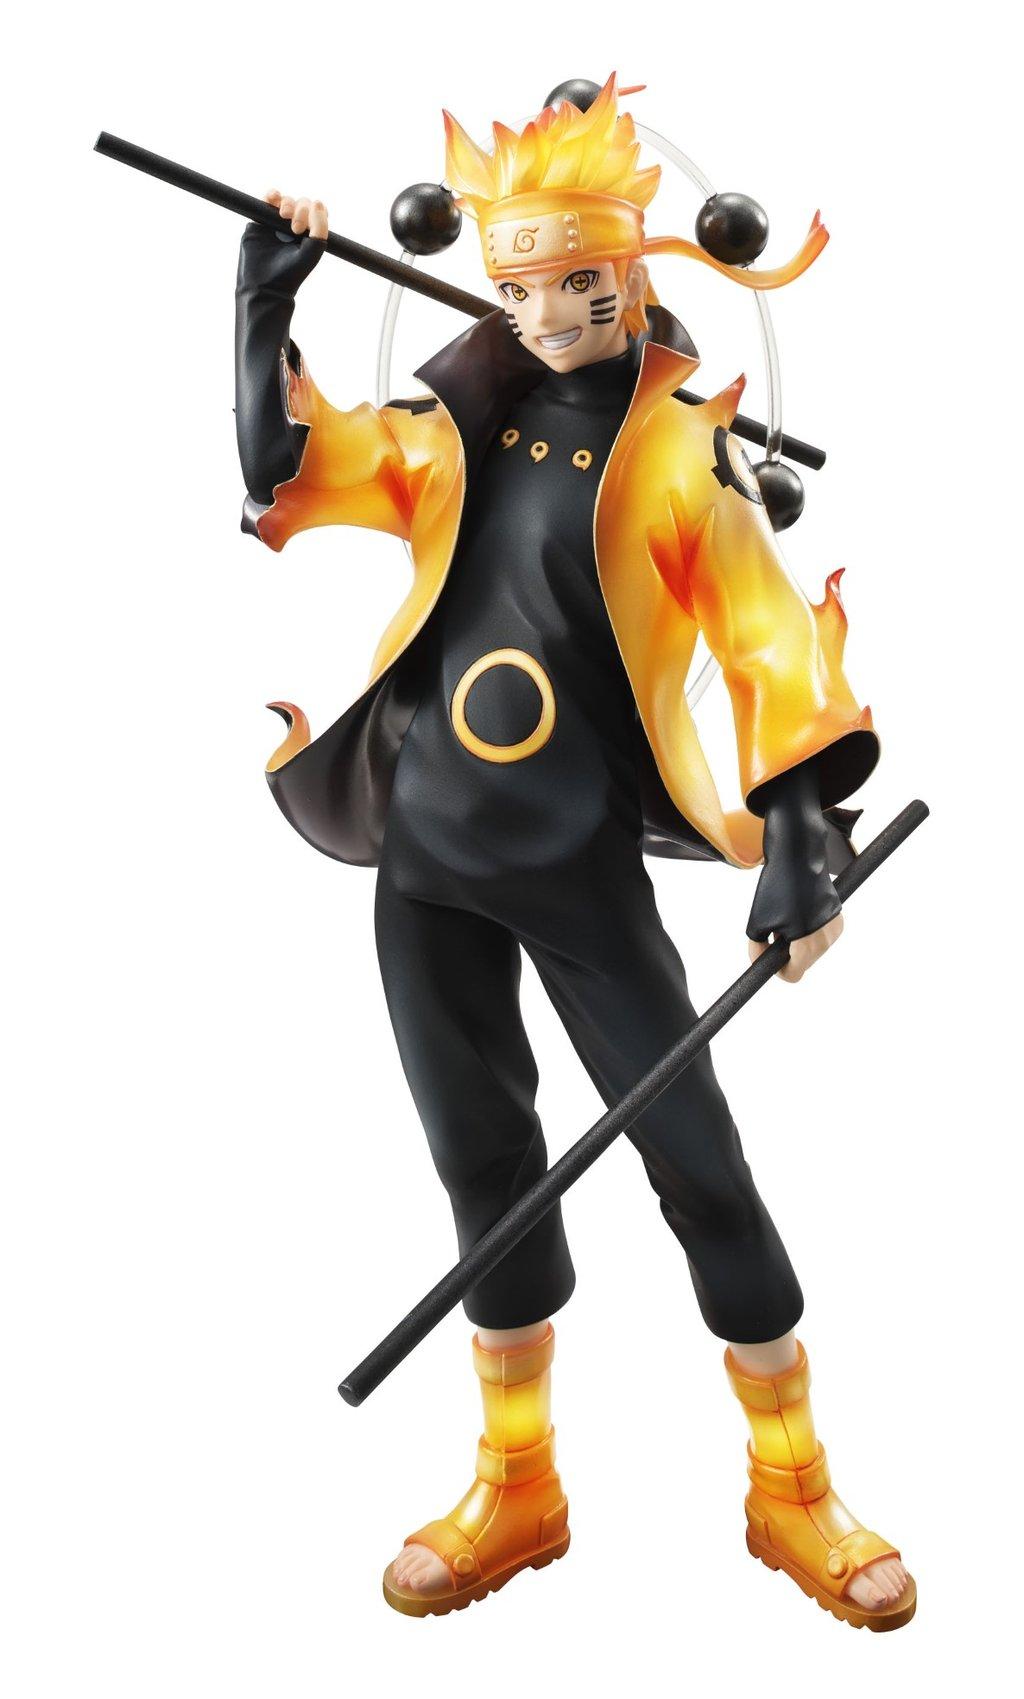 MegaHouse G.E.M. Series NARUTO Shippuden Uzumaki Naruto Rikudo Sennin Mode PVC Figure.jpg